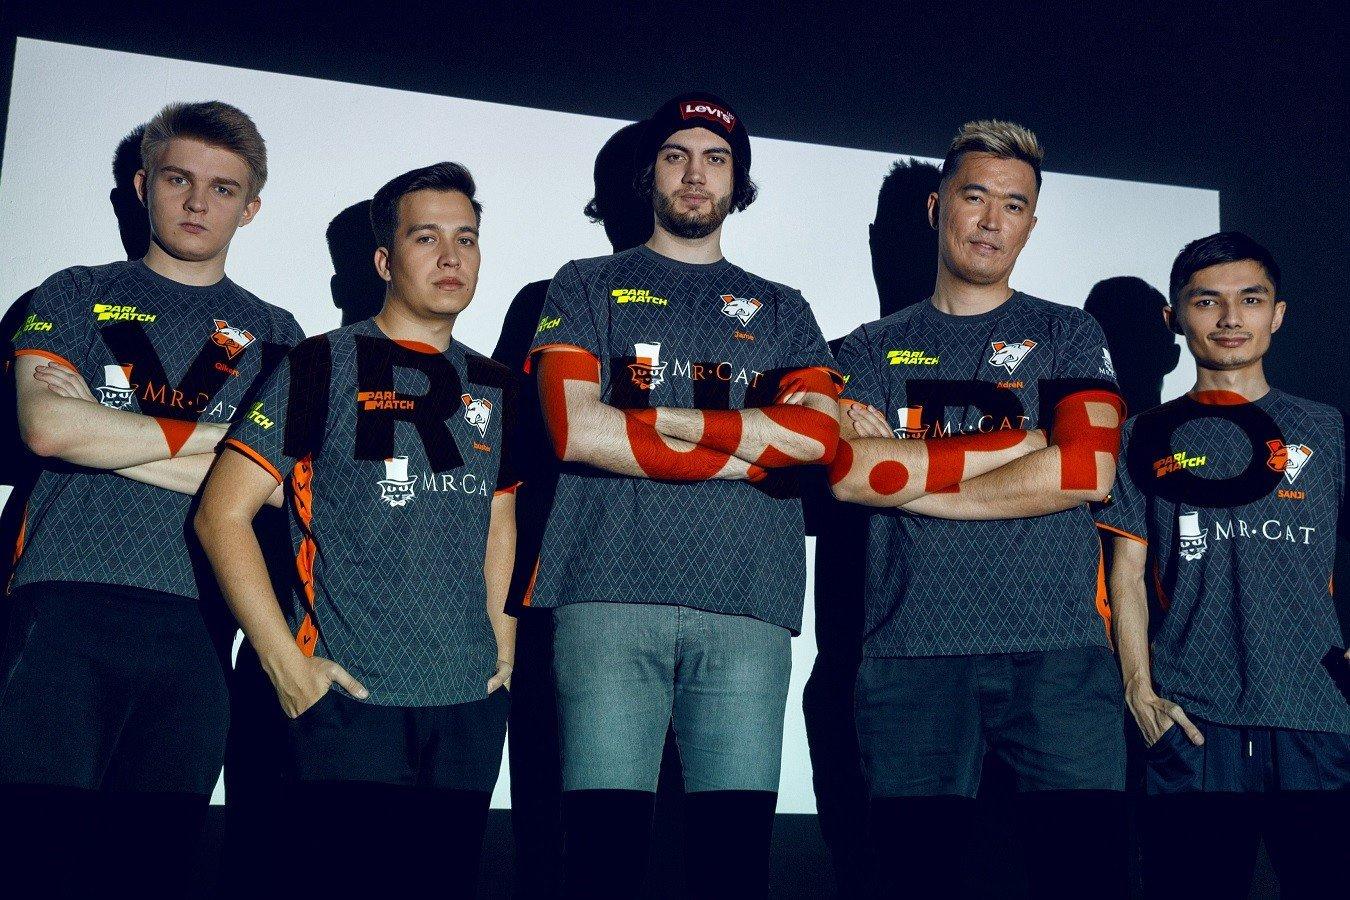 Virtuspro прошли в четвертьфинал BLAST Premier Fall 2020 Showdown одолев Team Spirit